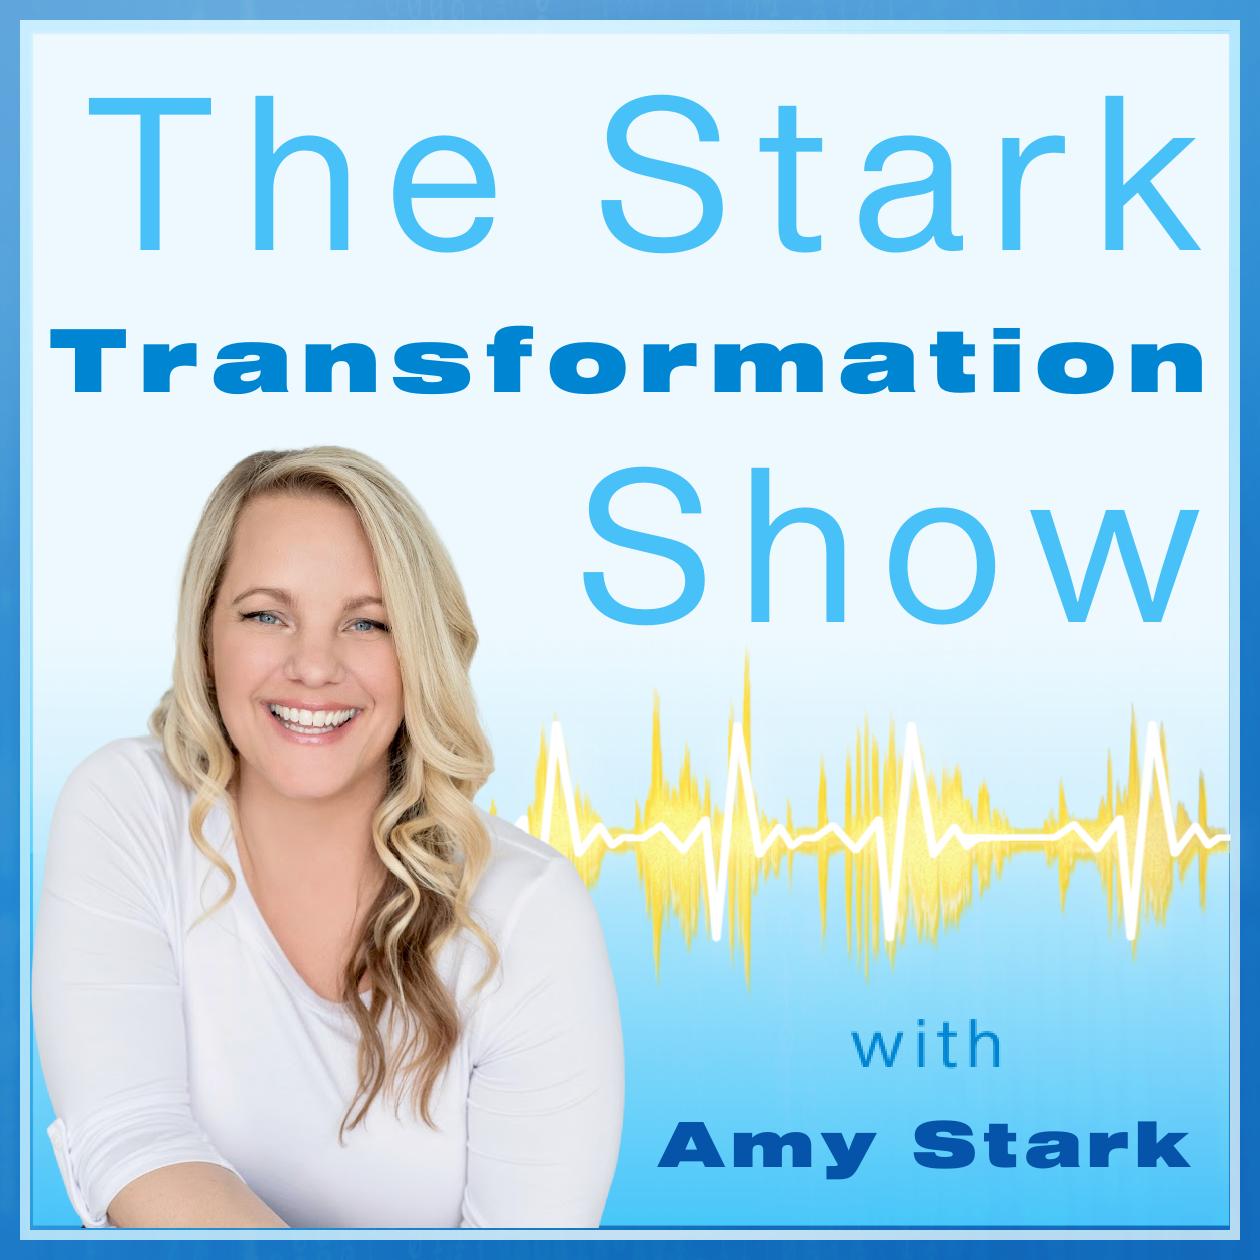 The Stark Transformation Show